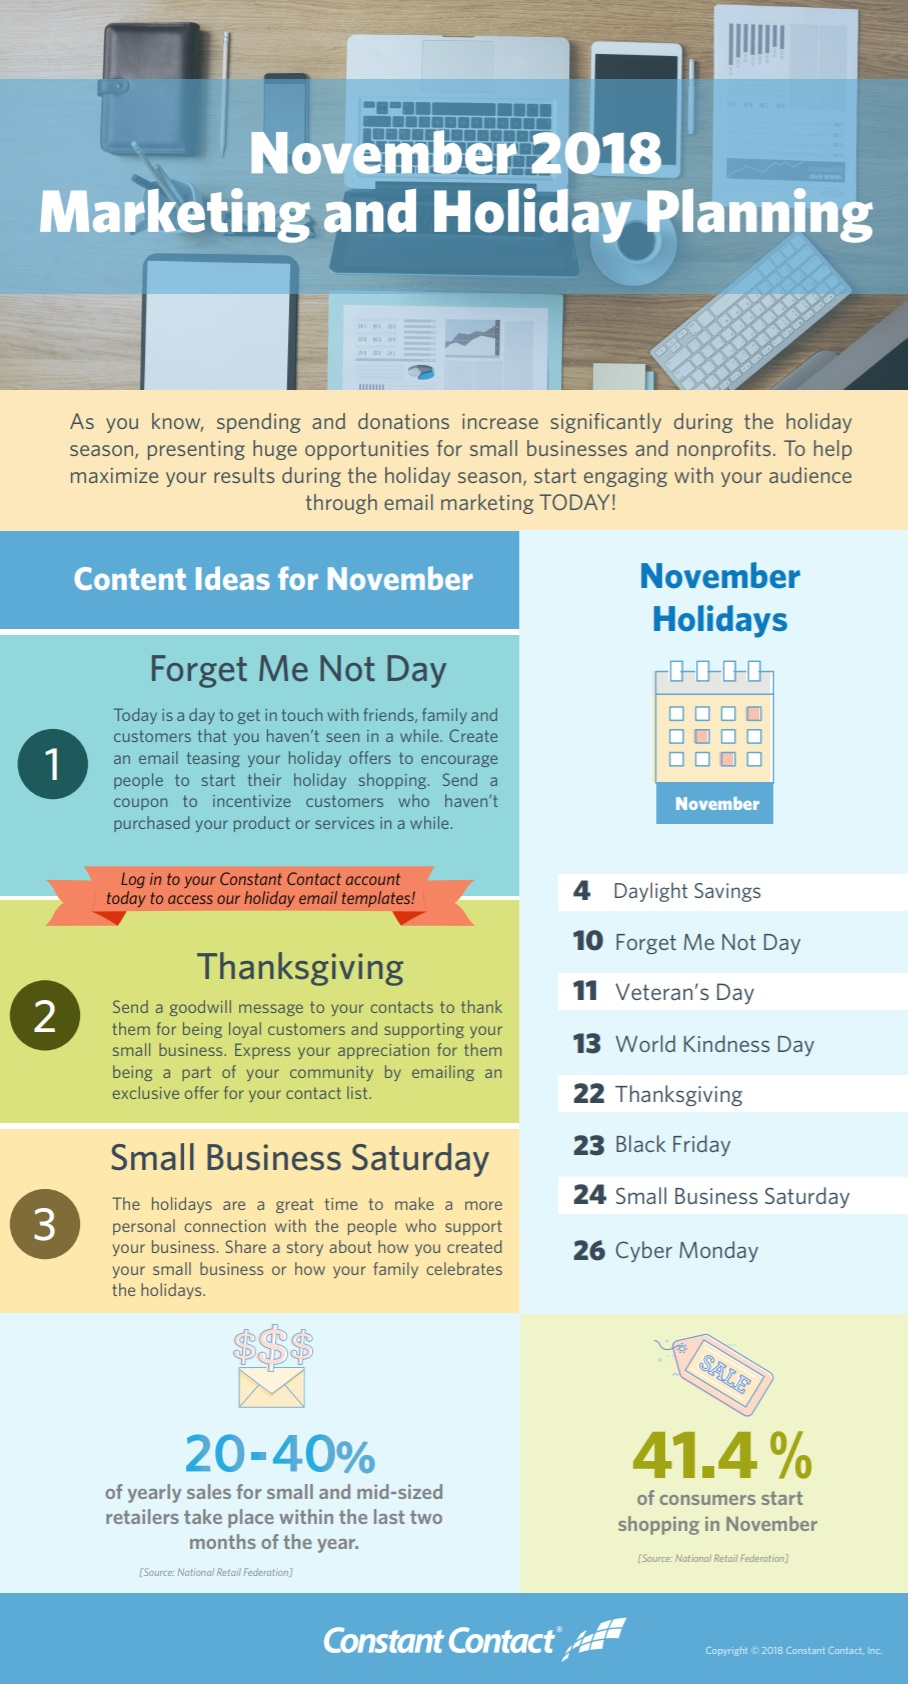 2018 November Holiday Infographic